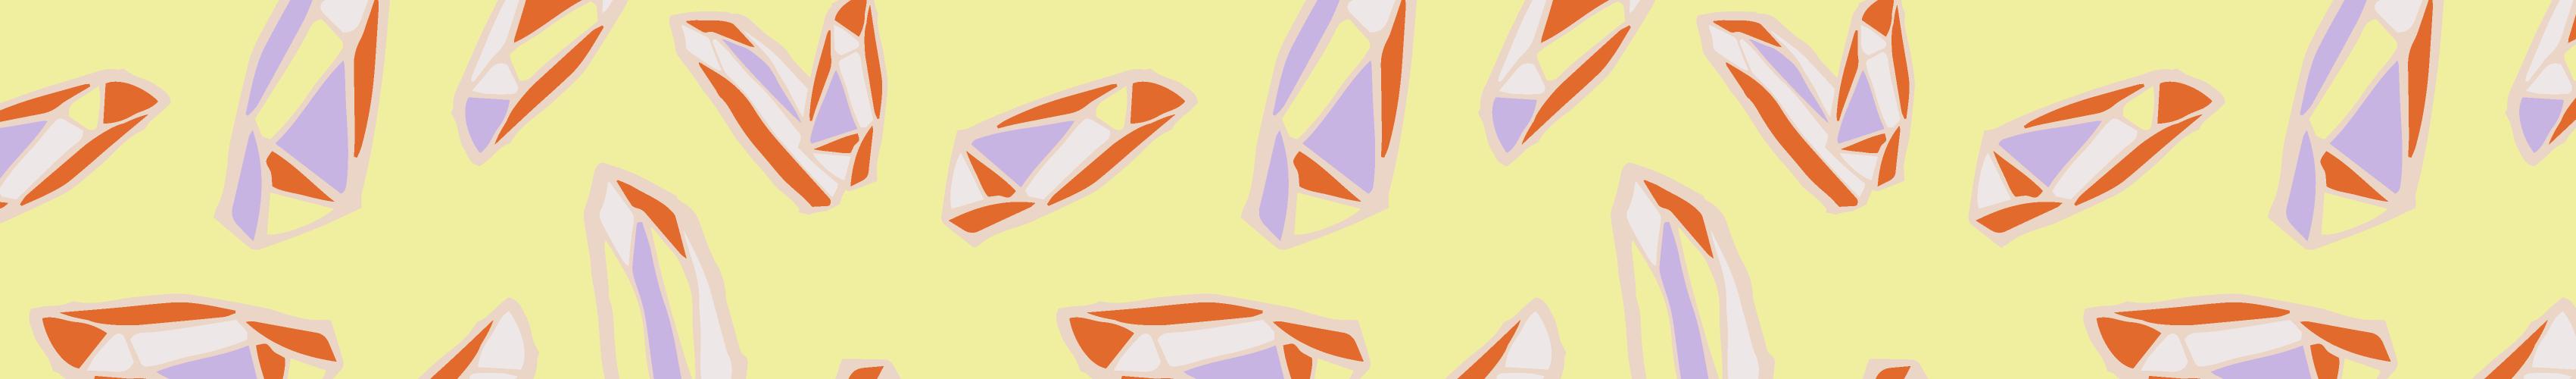 falling_diamonds_banner